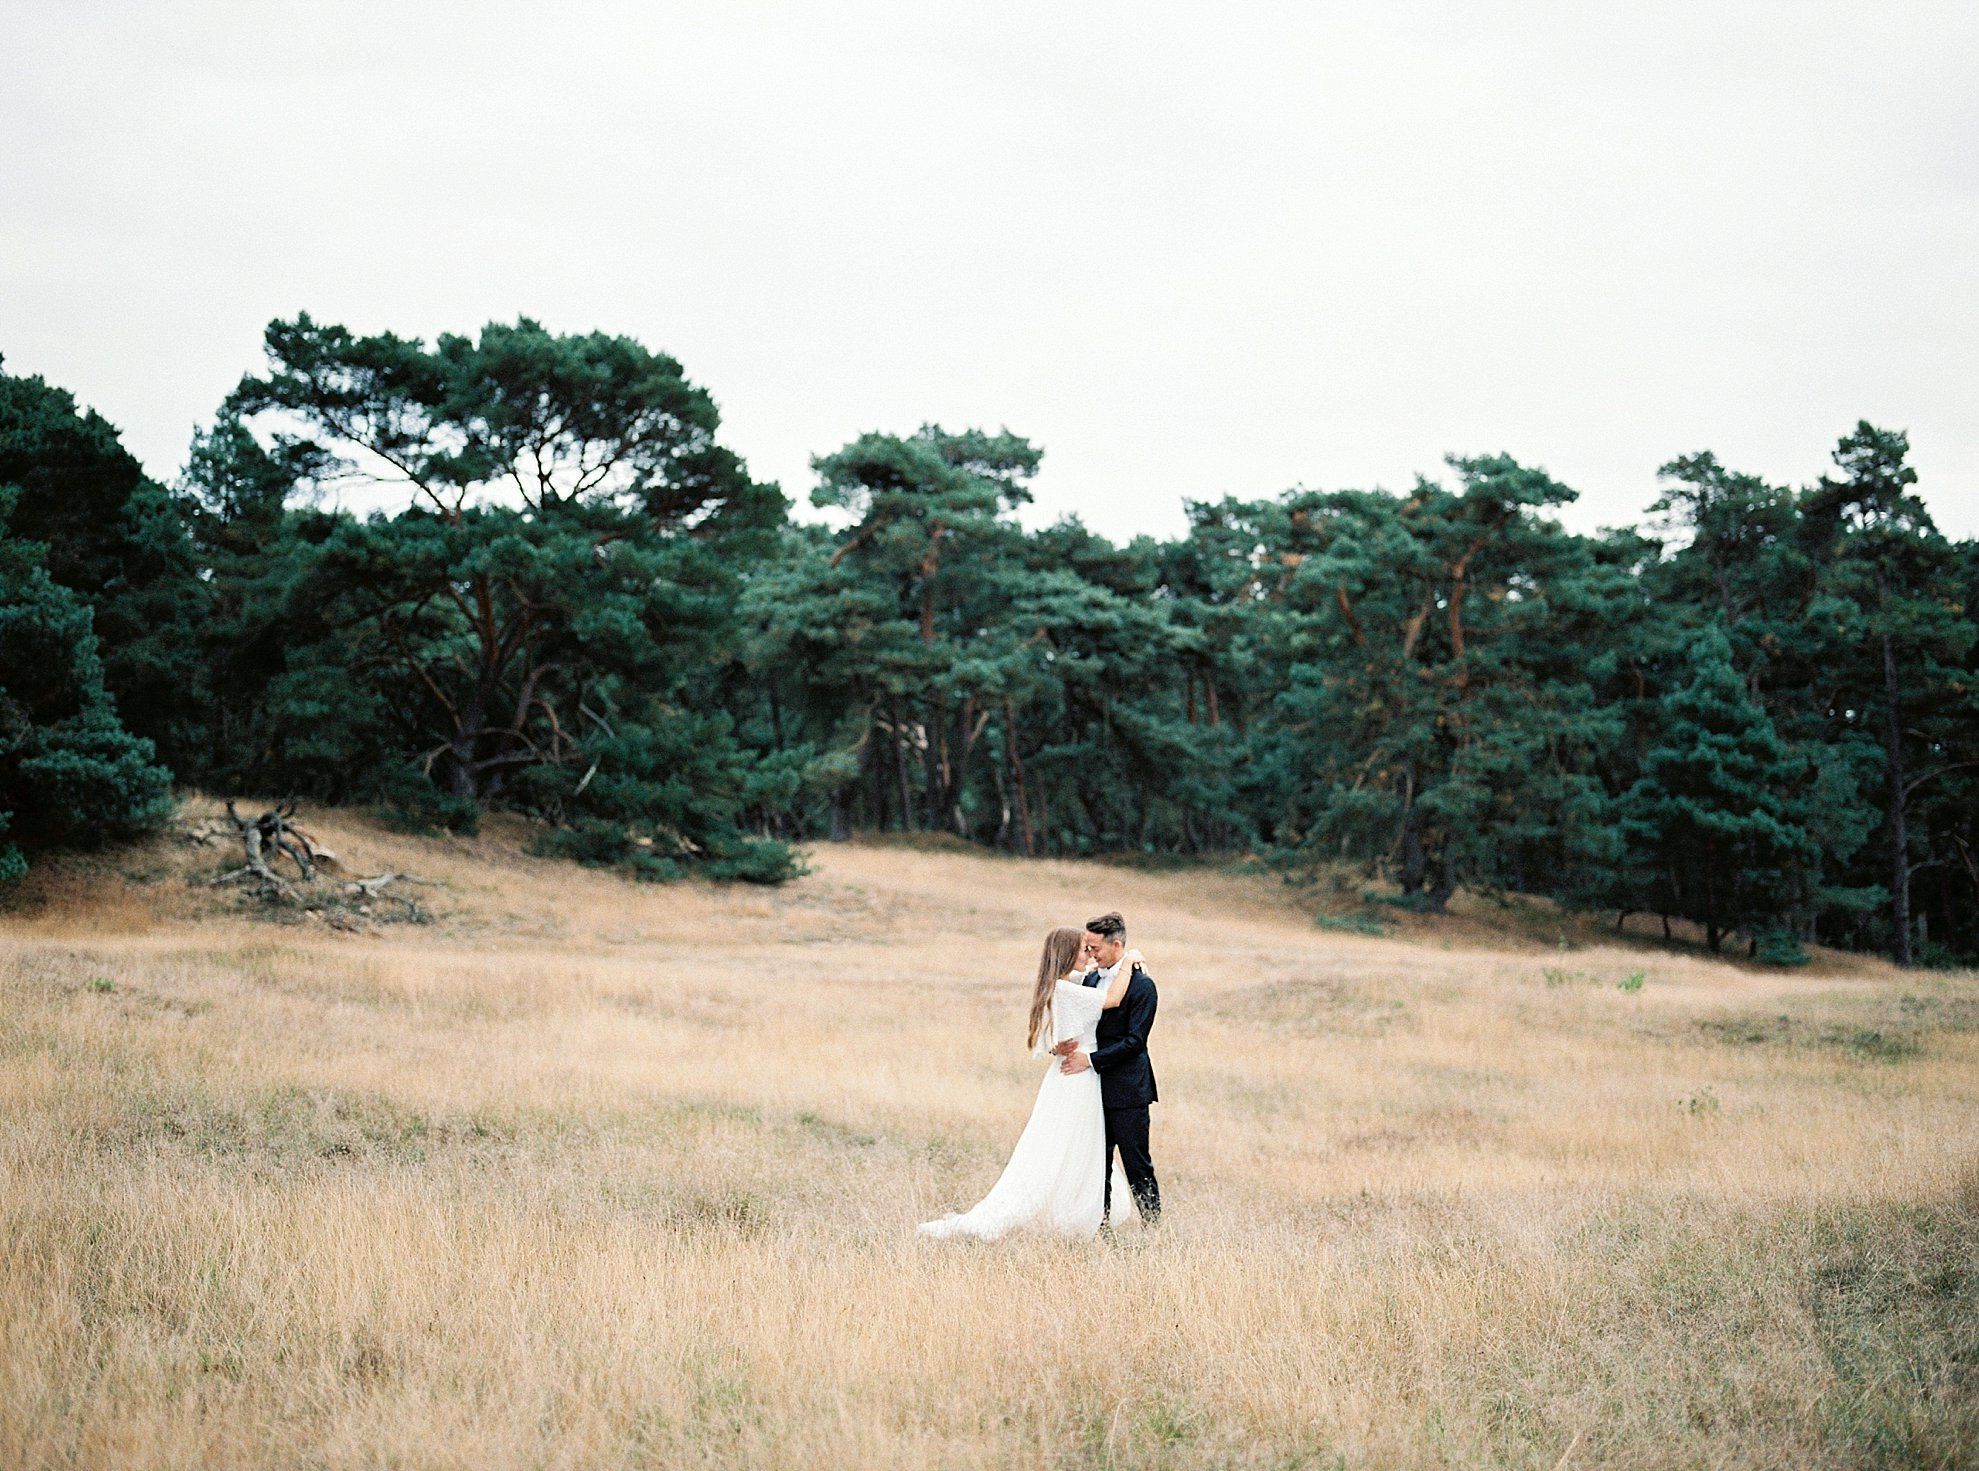 Amanda-Drost-photography-fine-art-nederland-couple-shoot-editorial_0001.jpg